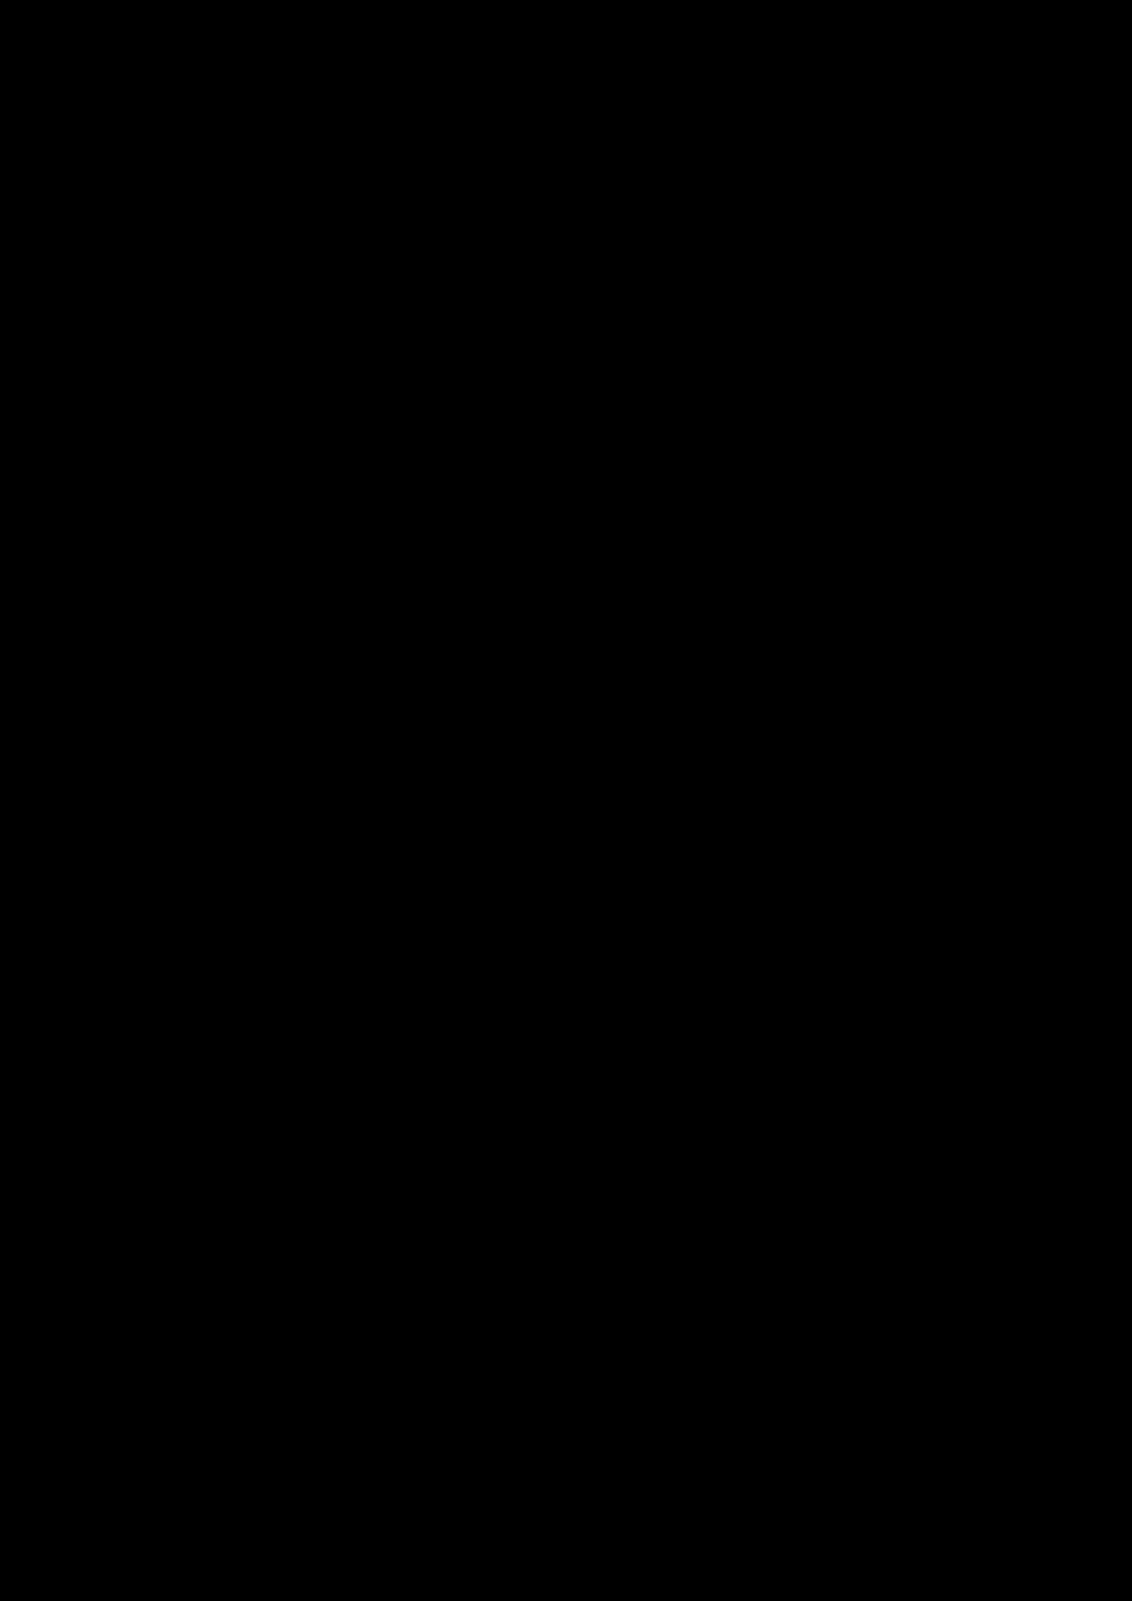 Korolevstvo slez slide, Image 46